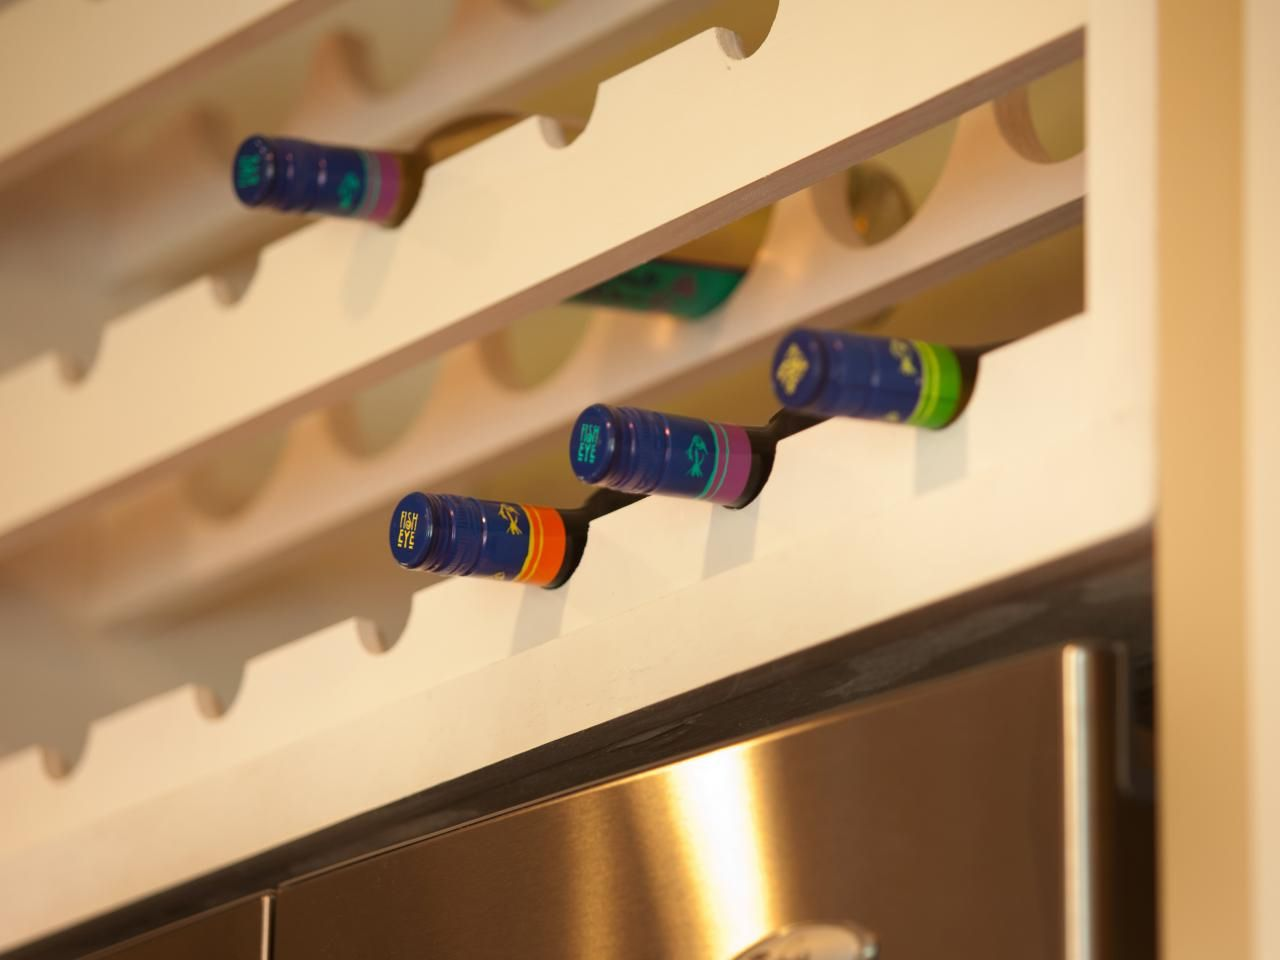 Under cabinet plate rack plans free - Under Cabinet Plate Rack Plans Free 47